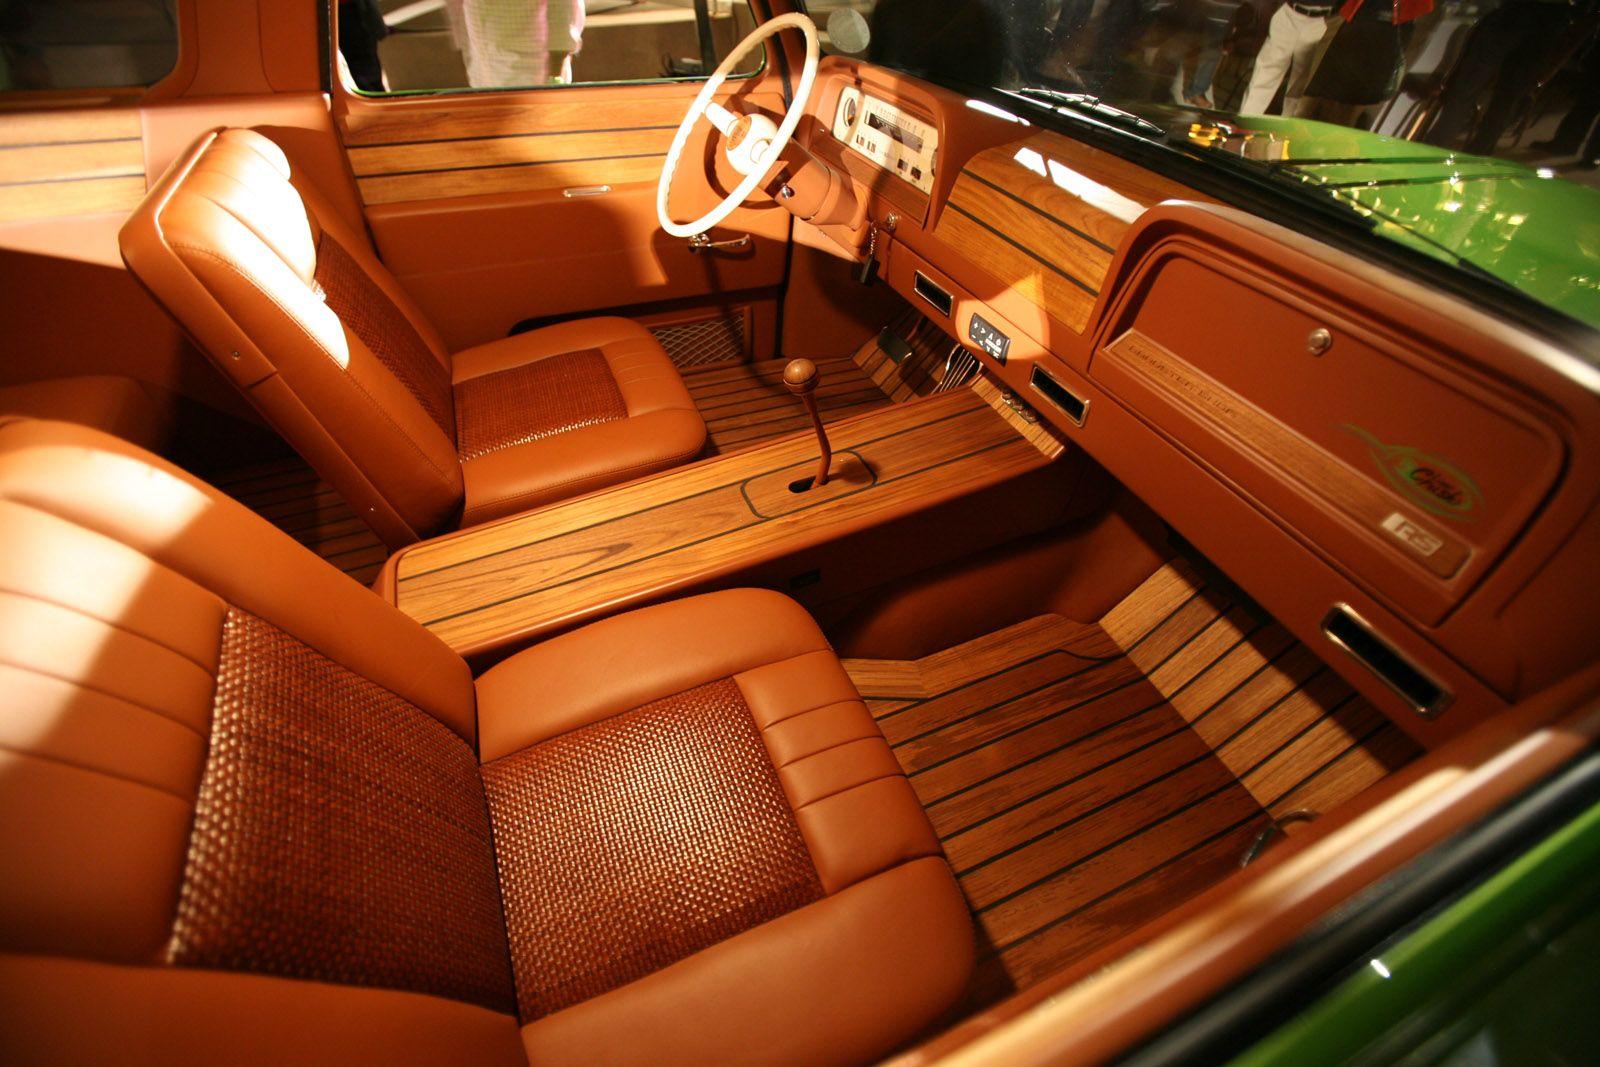 404 Not Found Truck Interior Chevrolet Suburban Roadster Shop